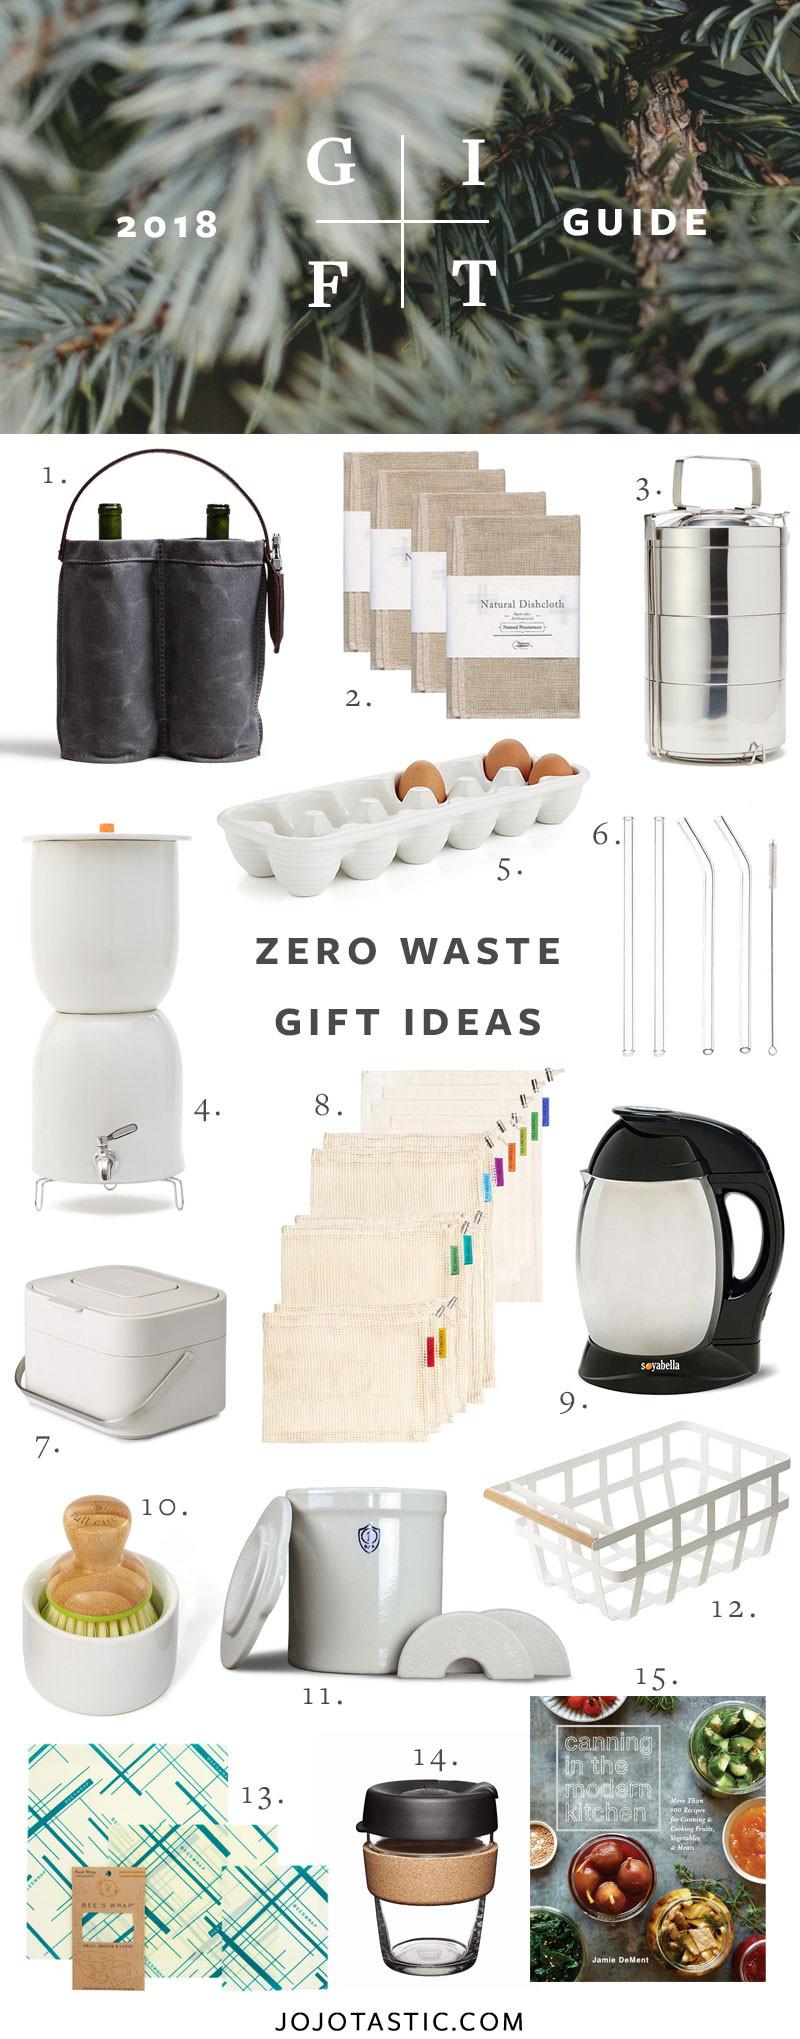 Best ideas about Zero Waste Gift Ideas . Save or Pin Zero Waste Gift Ideas for the Eco Conscious Now.